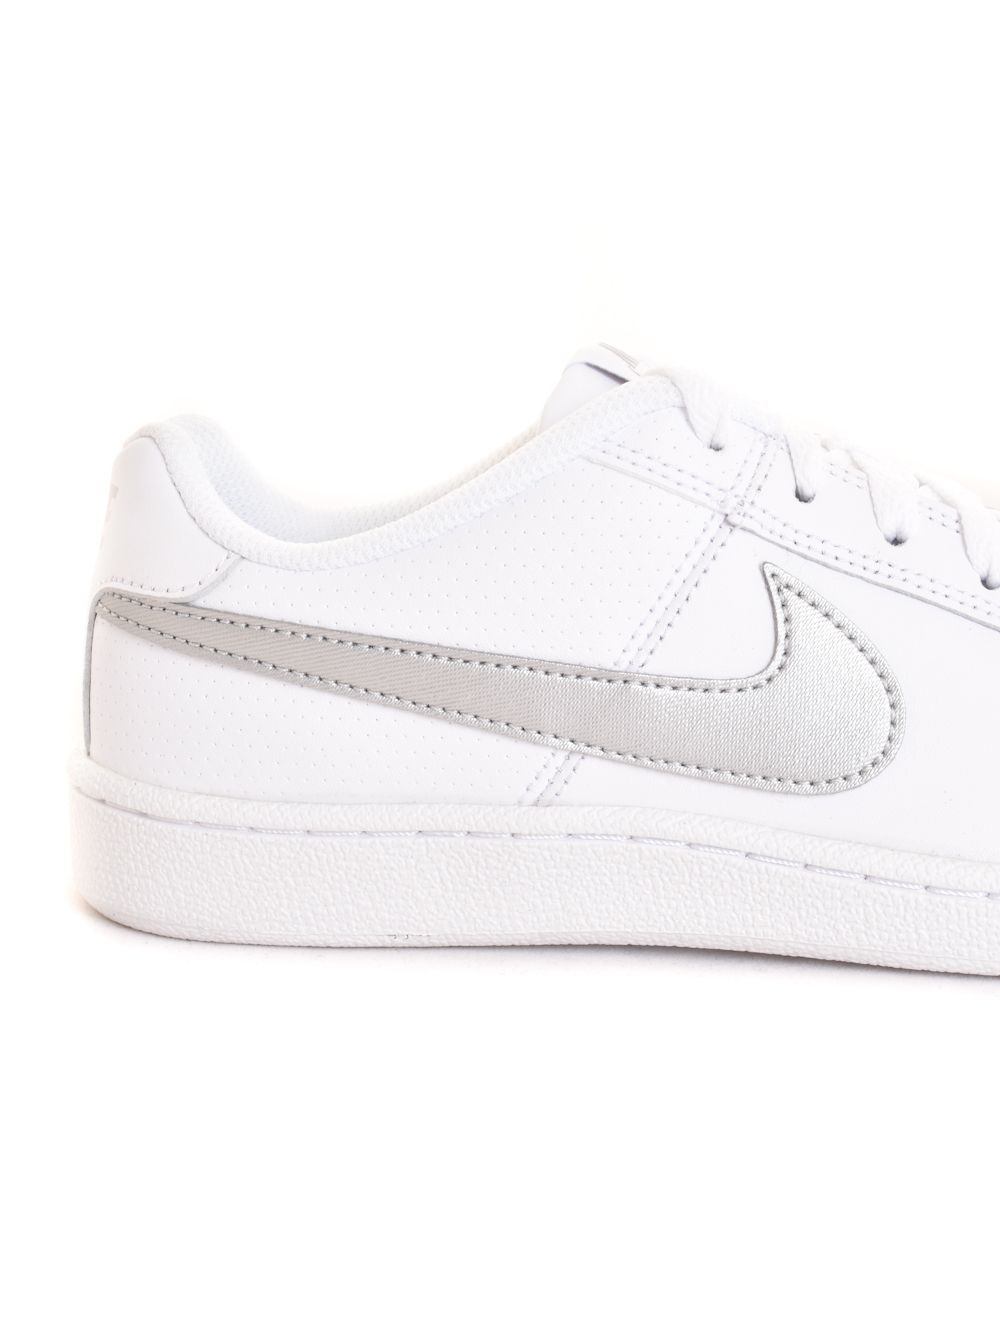 Wmns Nike Court Royale , Női cipő | utcai cipő , nike , Wmns